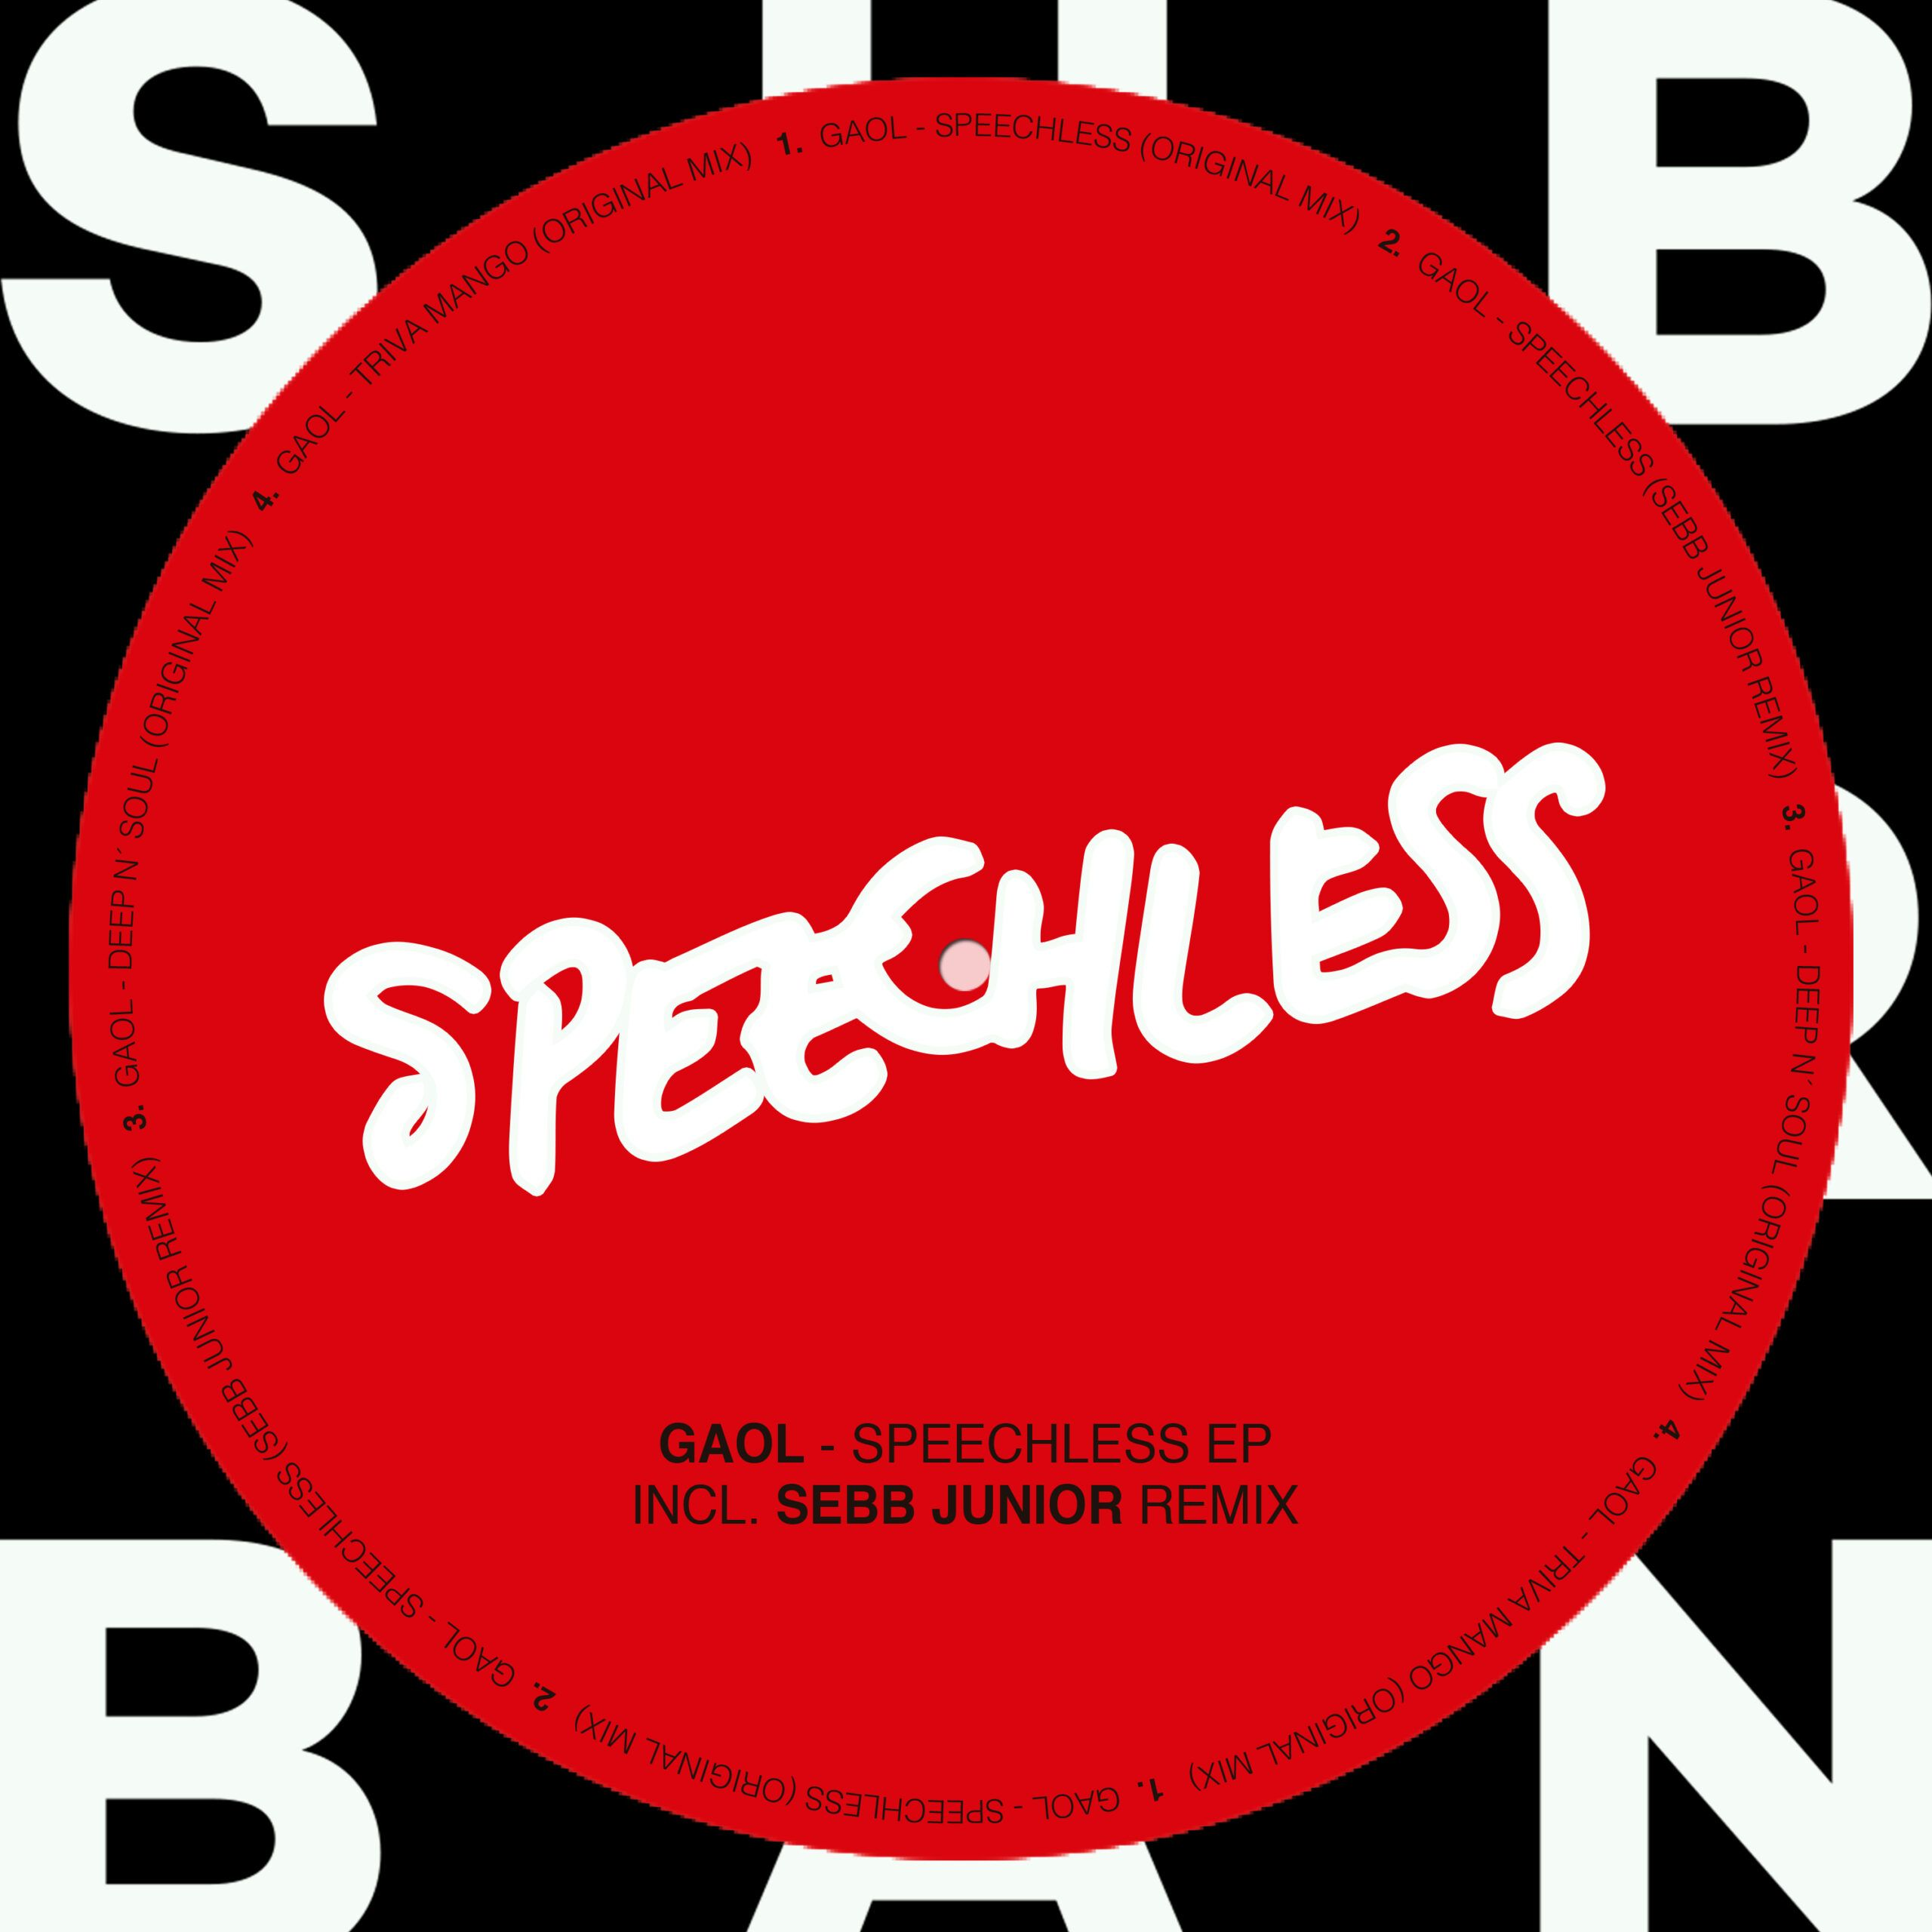 su042_-_gaol_-_speechless_ep_incl._sebb_junior_remix.jpg